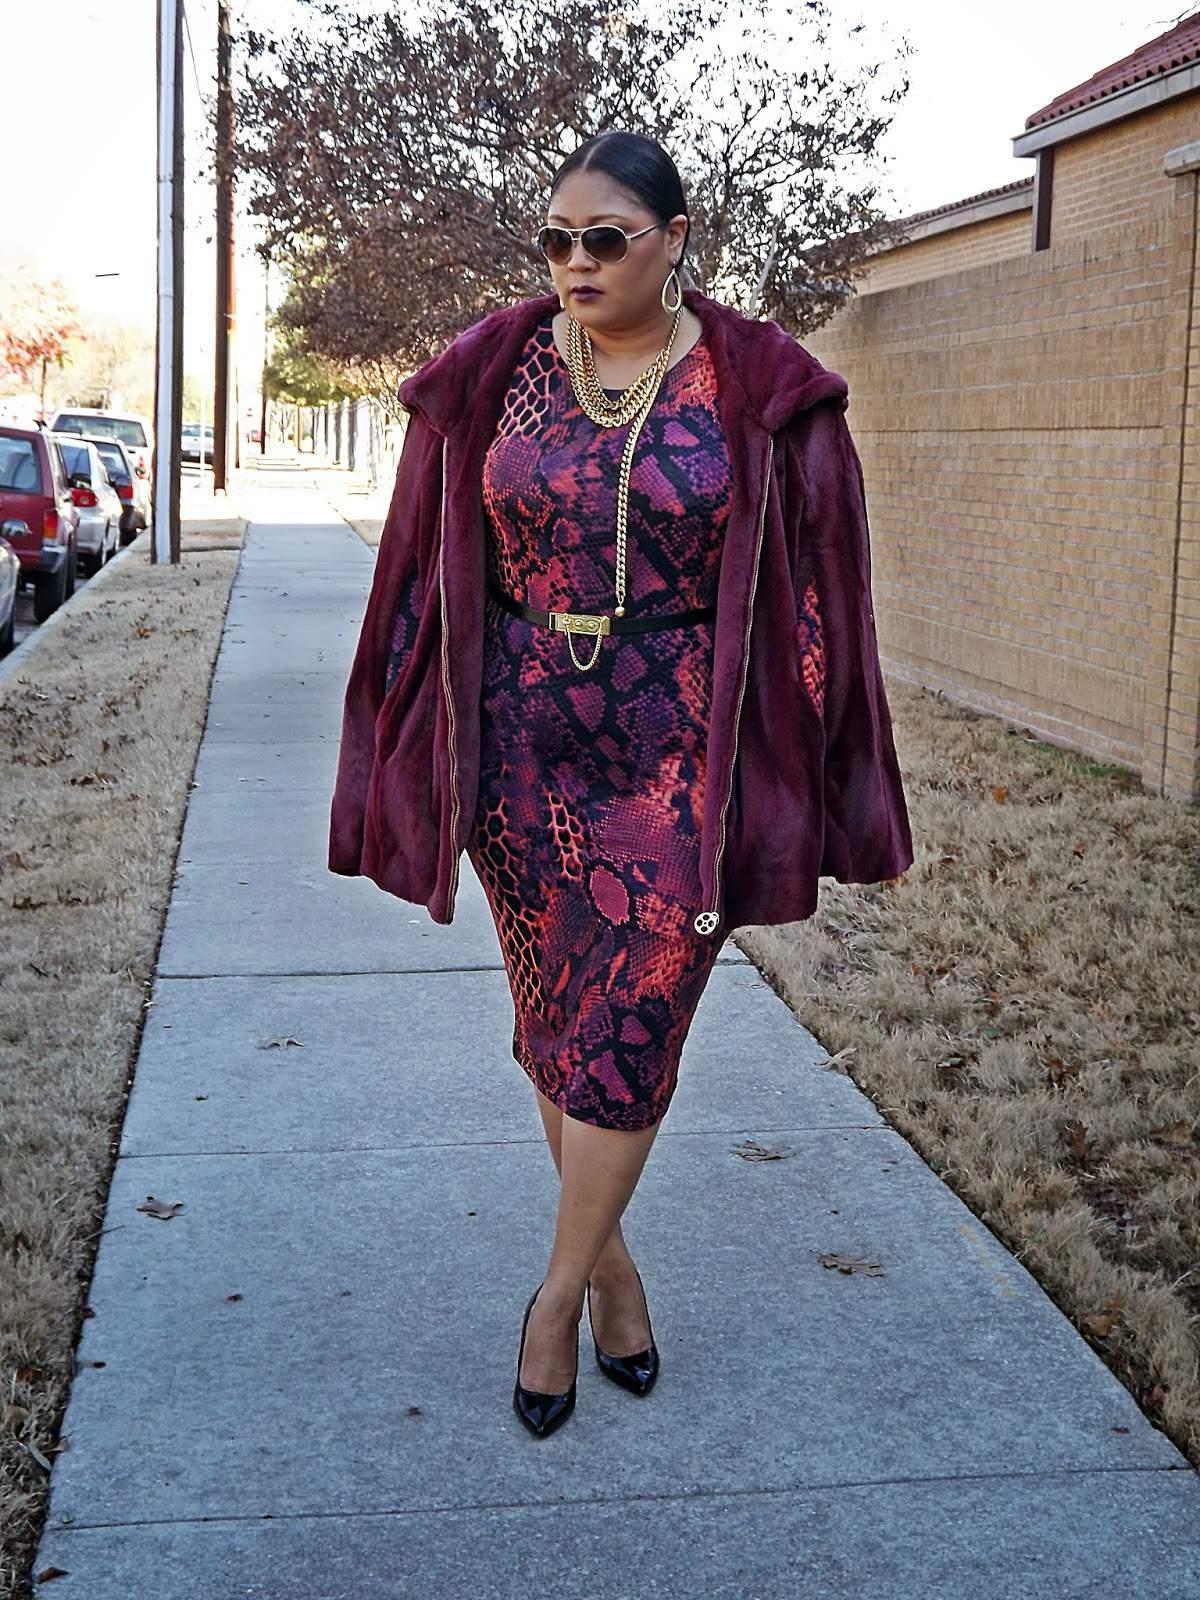 Fashion Blogger Spotlight: Meet Kiah of From The Rez To The City